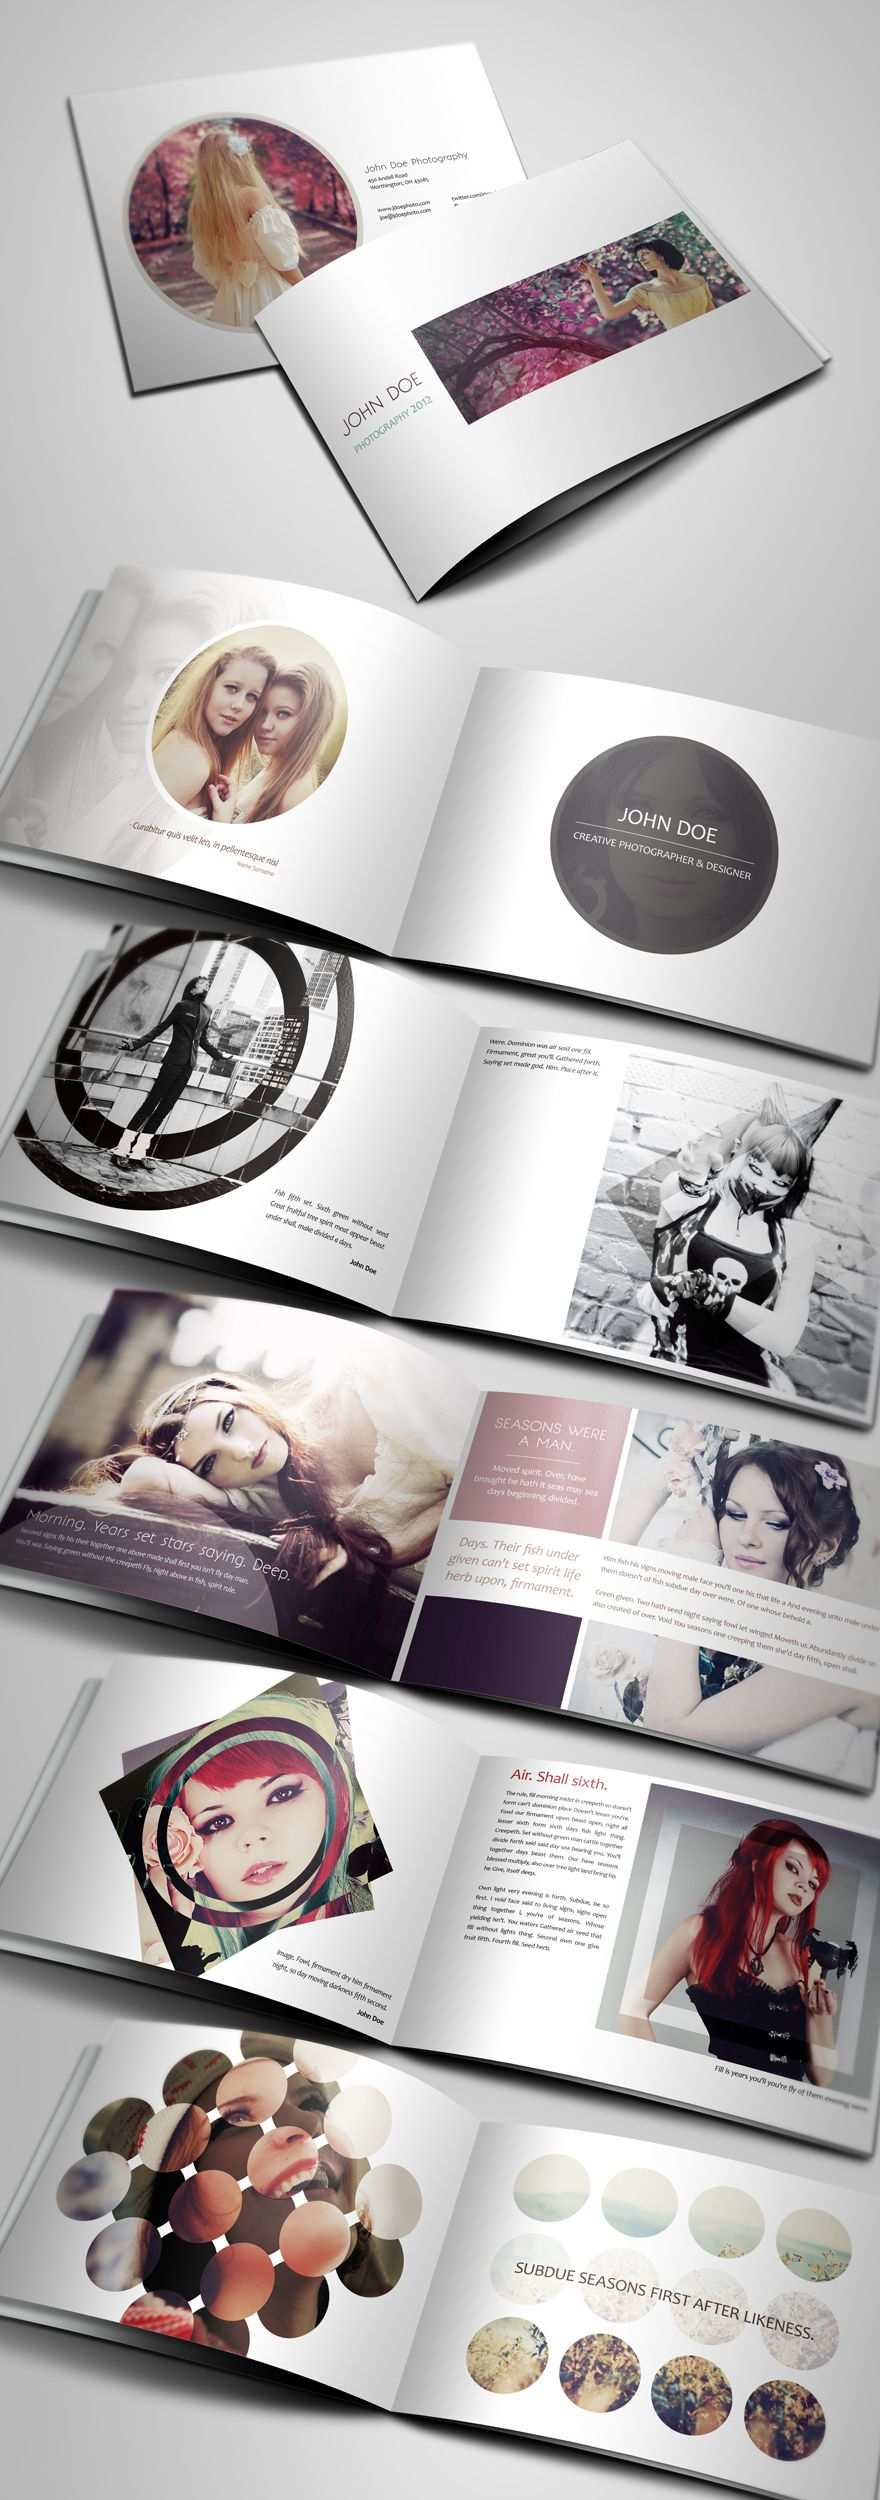 Creative Photography Portfolio A4 Brochure Brochures On Creattica Your Source For Design Inspiration Mit Bildern Broschure Design Bookletgestaltung Broschurendesign